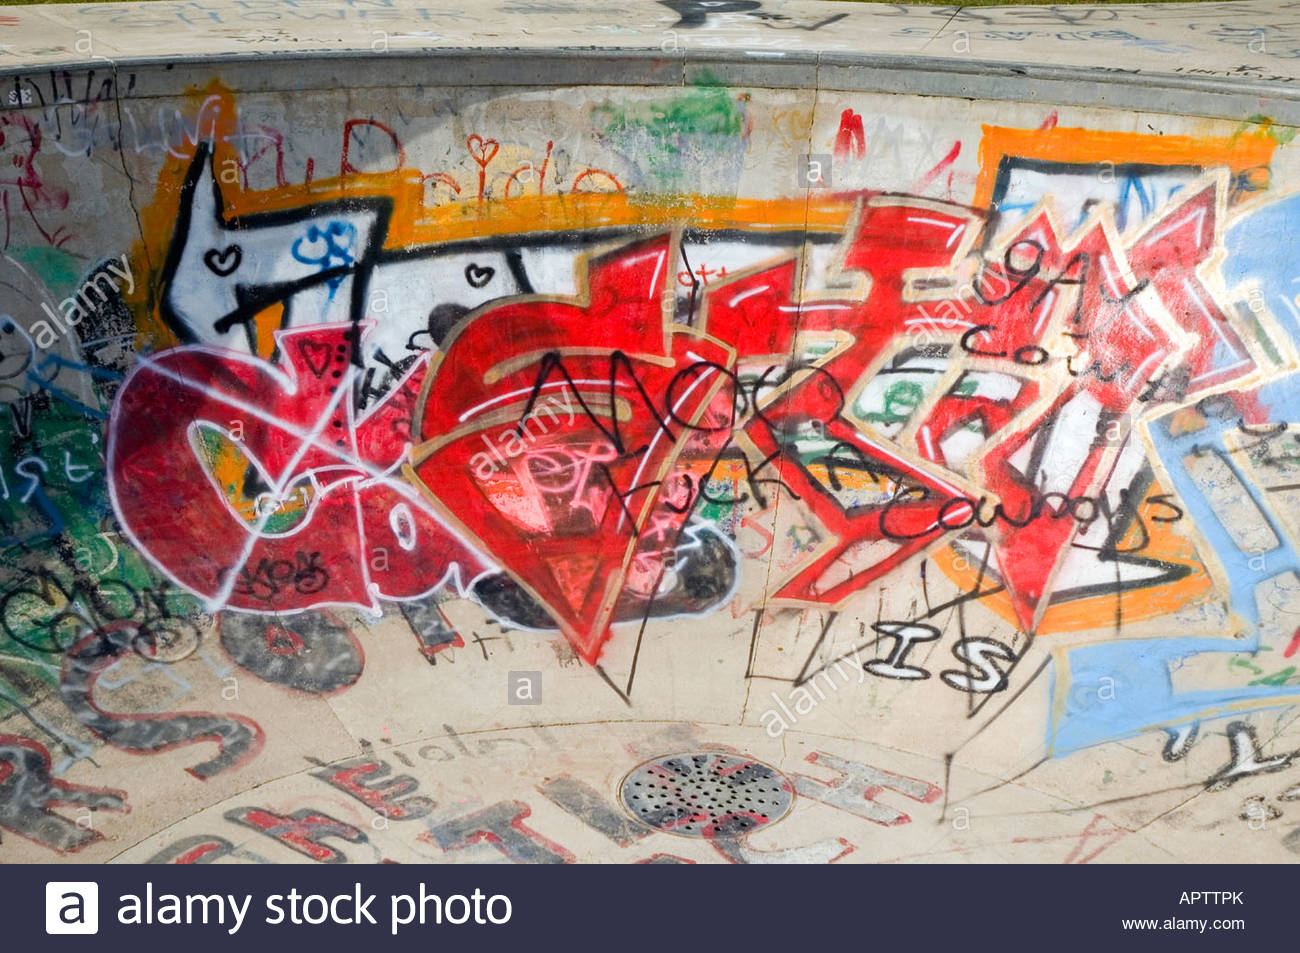 Graffiti on a skate park concrete wall stock photo royalty free graffiti on a skate park concrete wall altavistaventures Images